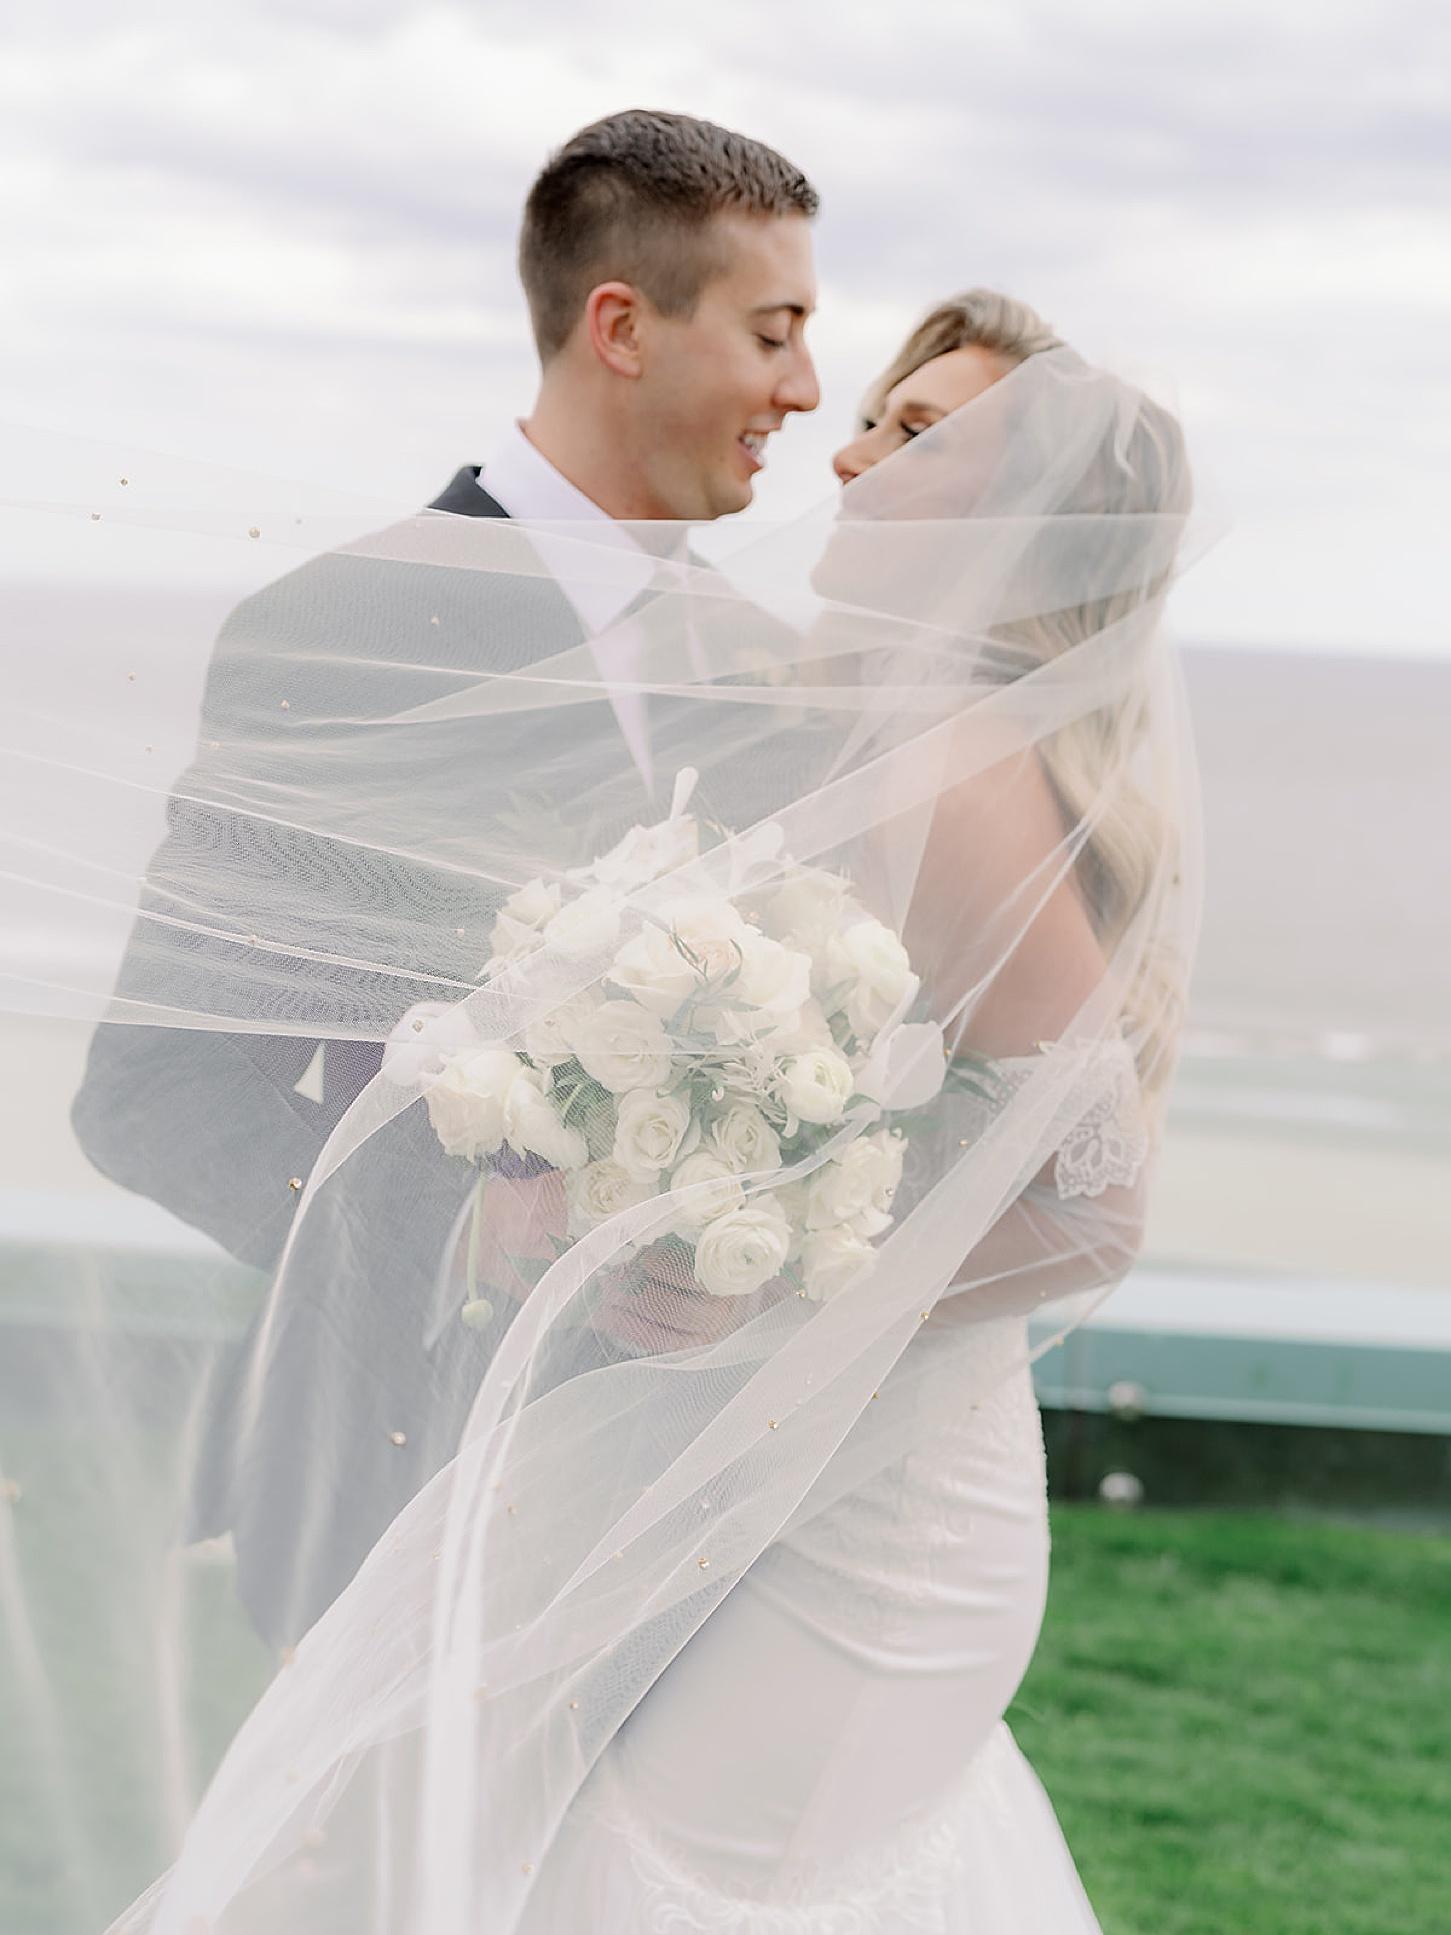 Atlantic City Wedding Photography Studio by Magdalena Studios Lexy Cha 0049